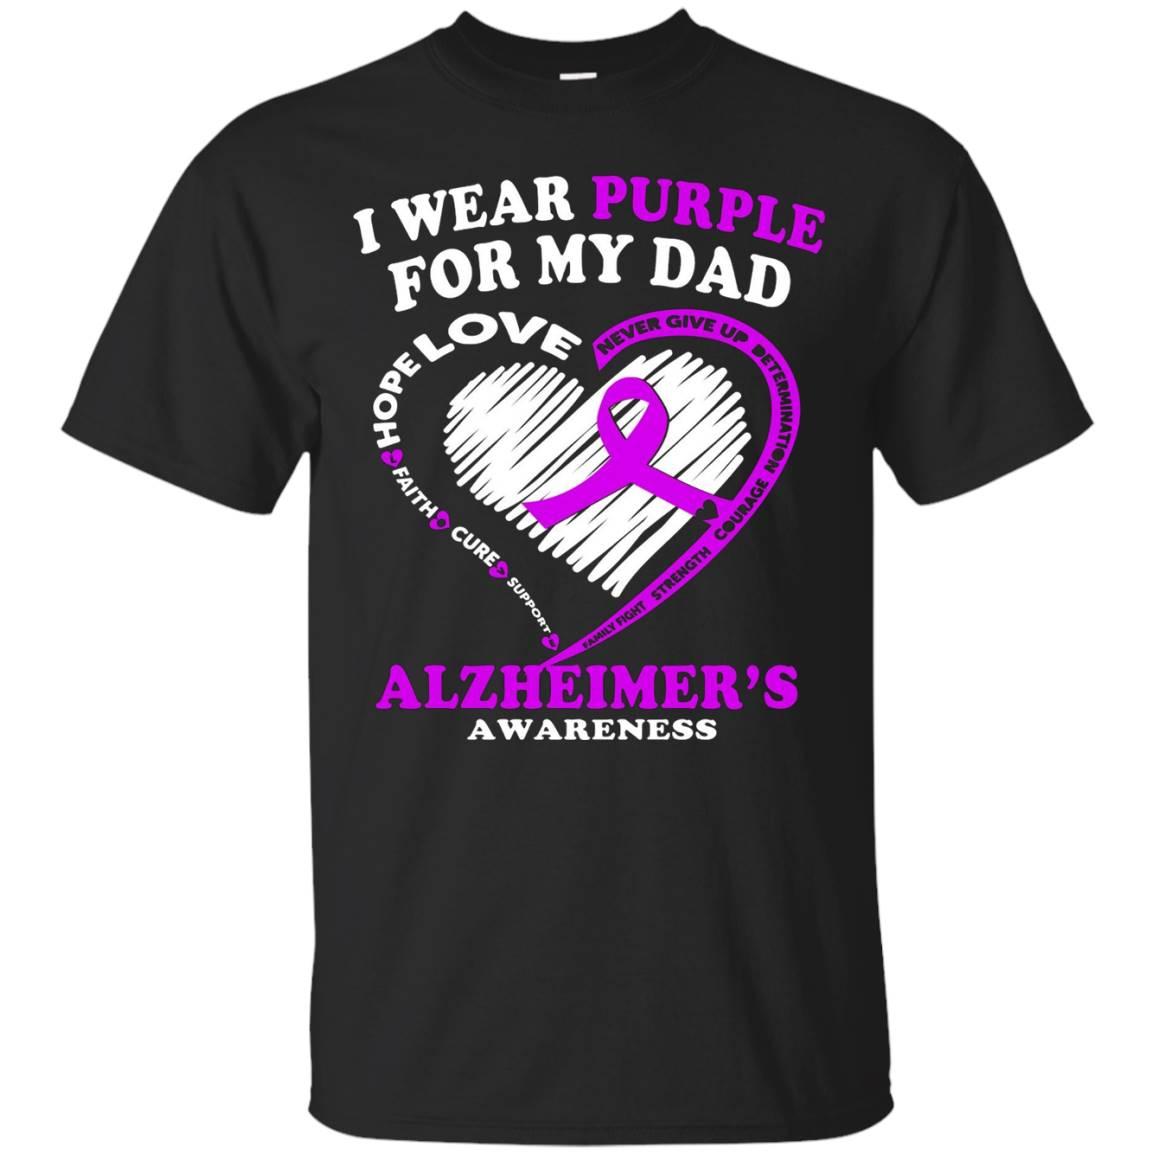 Alzheimers Awareness Shirt – I Wear Purple For My Dad